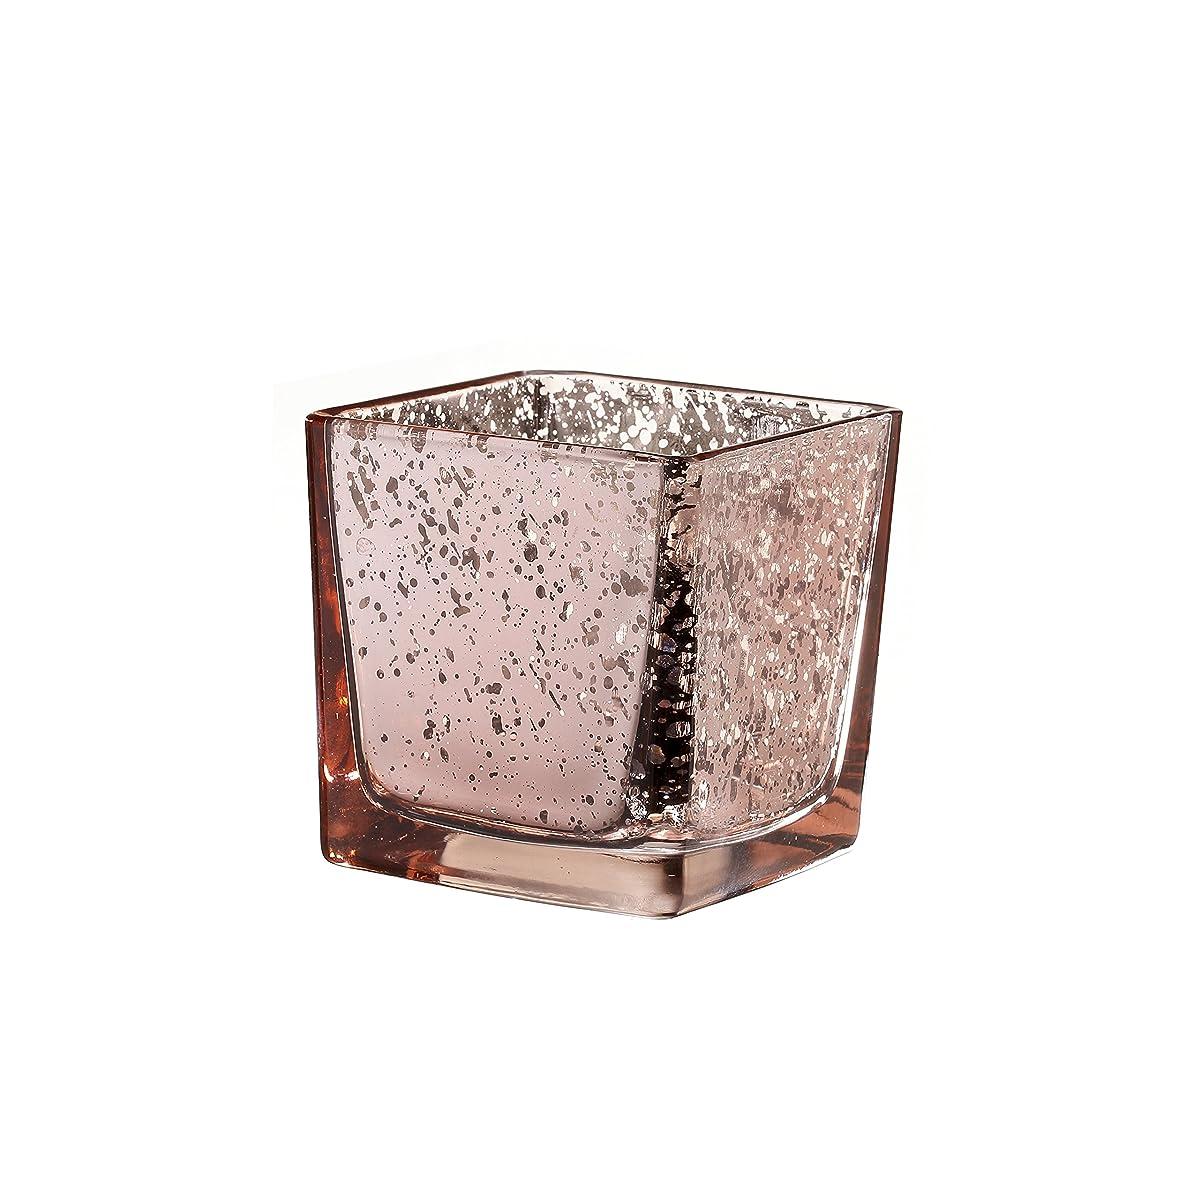 V-More Square Cube Mercury Glass Candle Holder, Votive Candle Holder, Tealight Holder, Flower Vase, 3.15-inch Tall, For Home Decor, Wedding, Party, Celebration (Set of 6, Rose Gold)